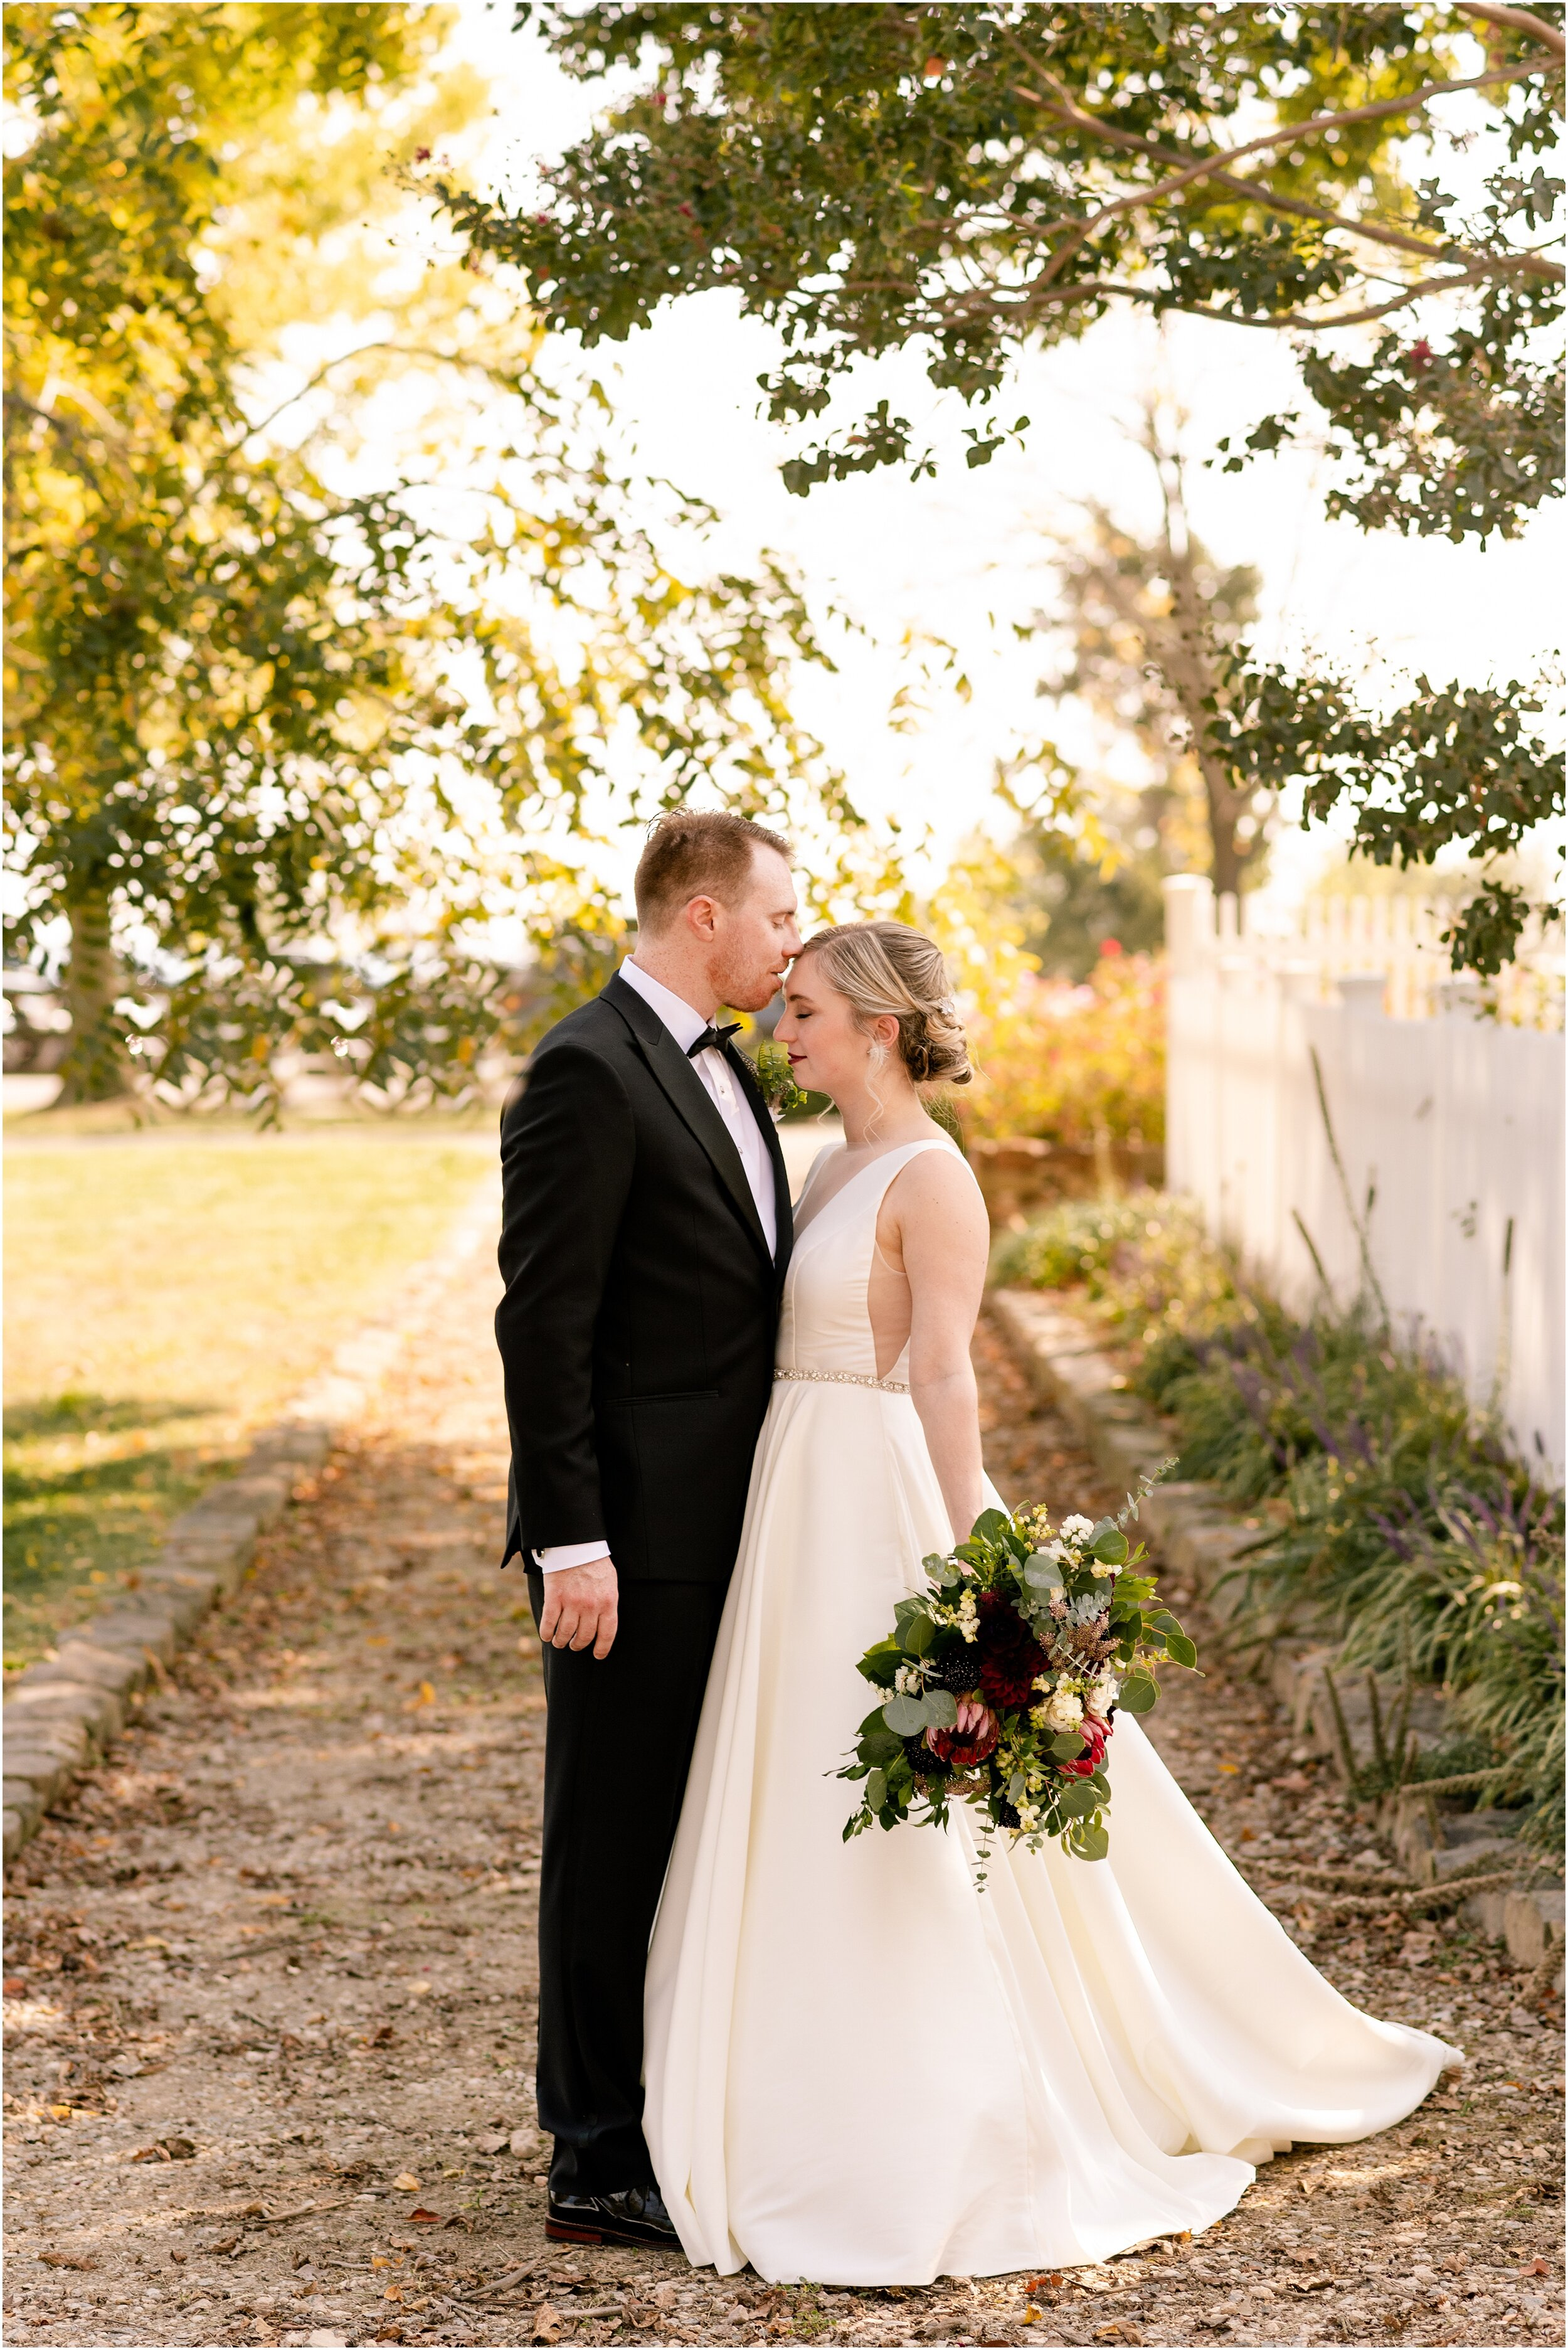 hannah leigh photography stone tower winery wedding leesburg va_3984.jpg